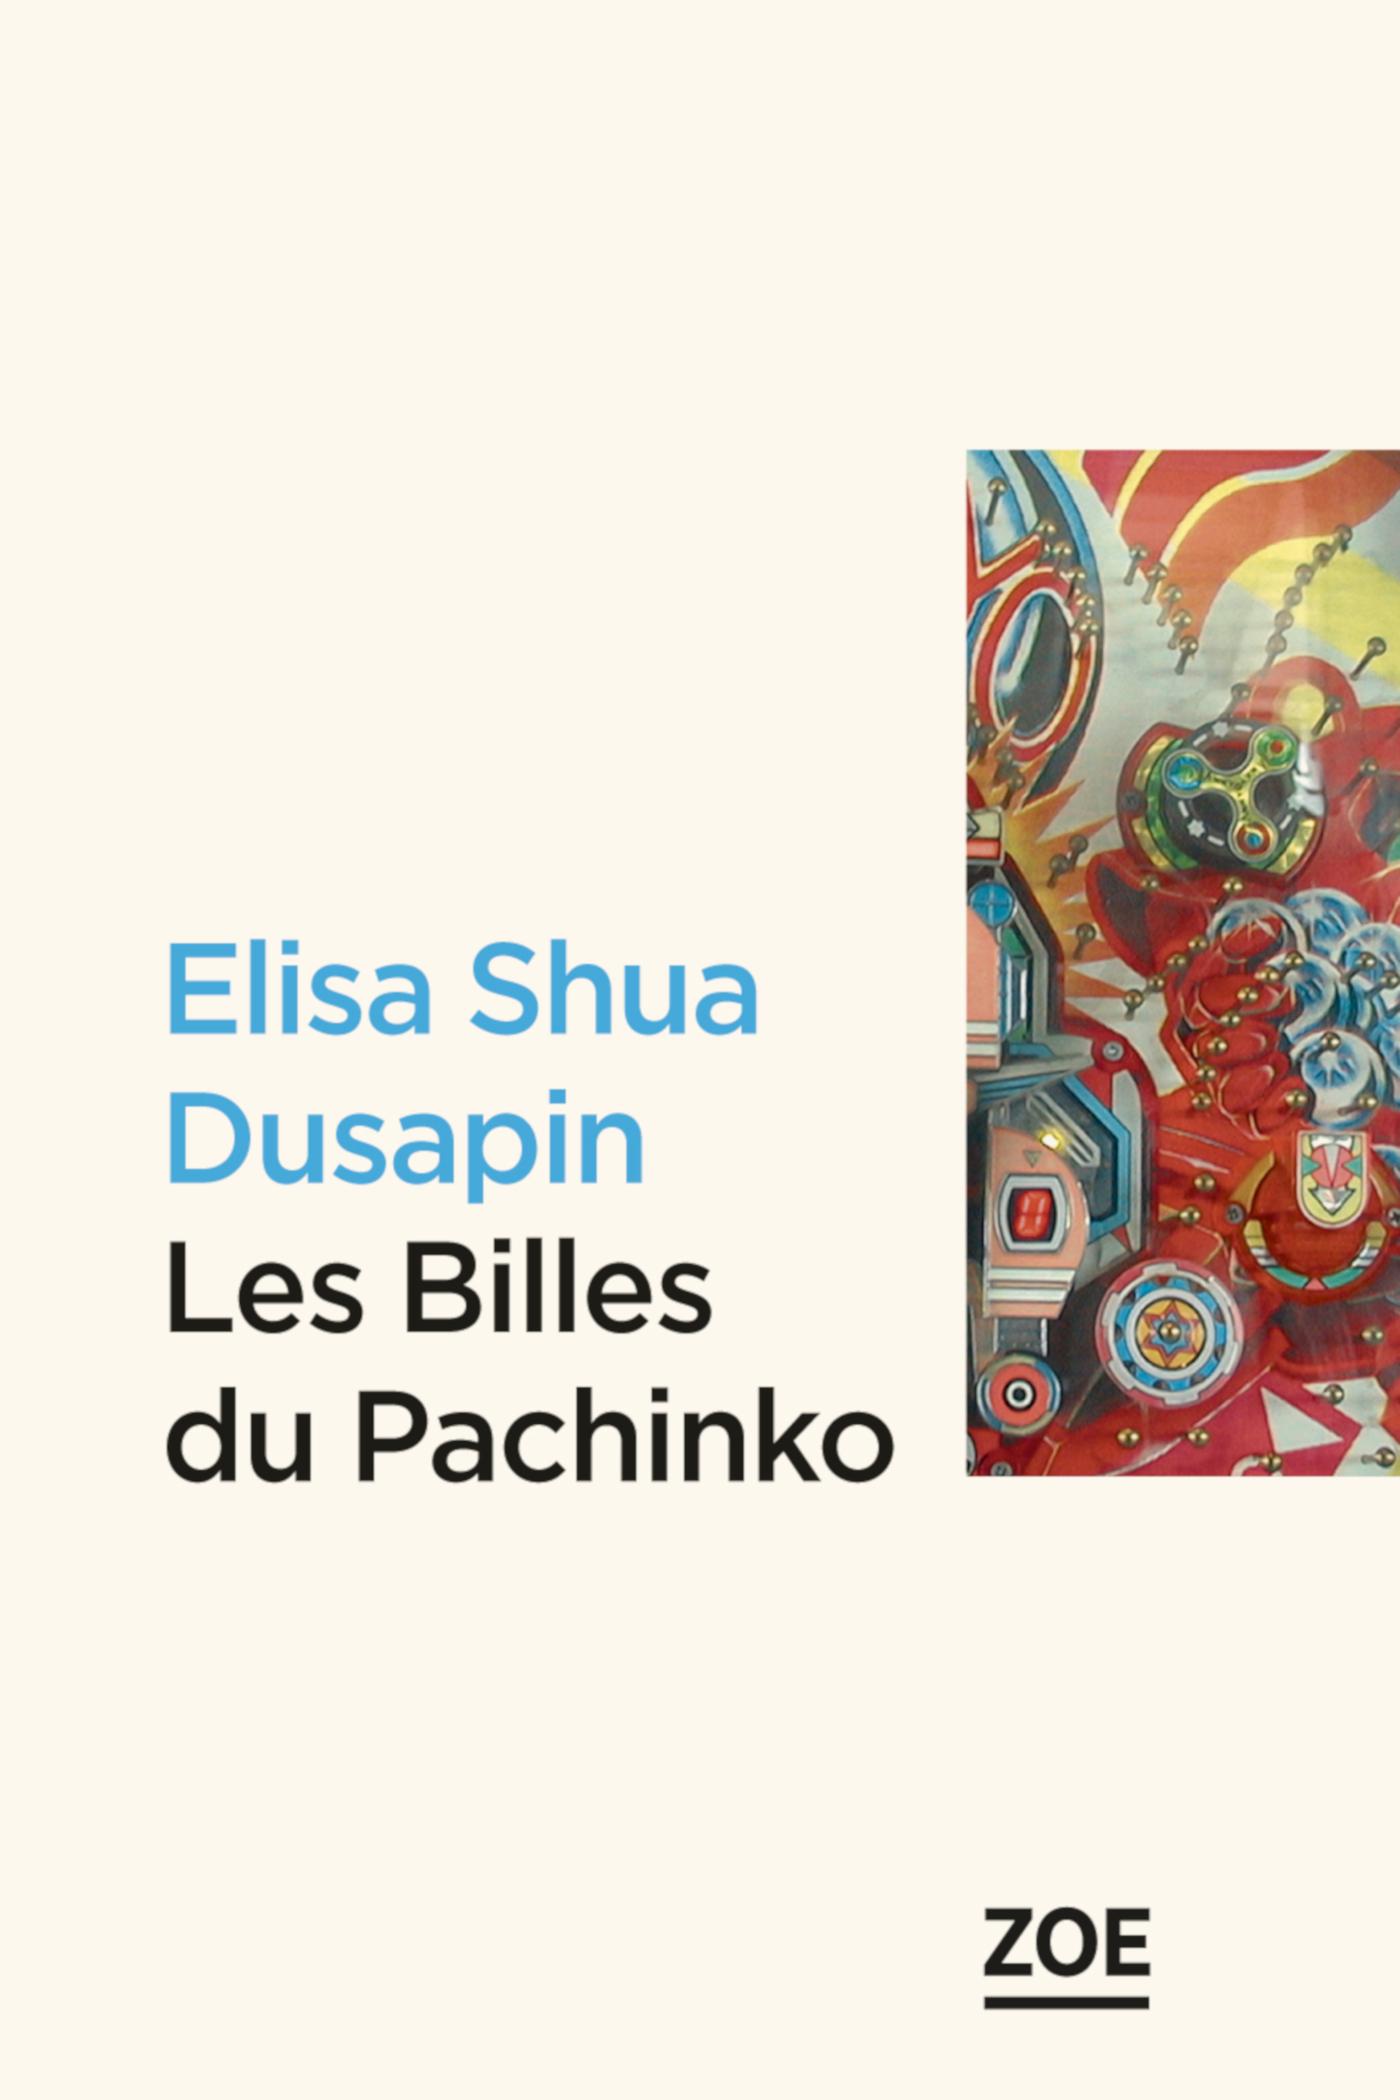 Les Billes du Pachinko | DUSAPIN, Elisa Shua